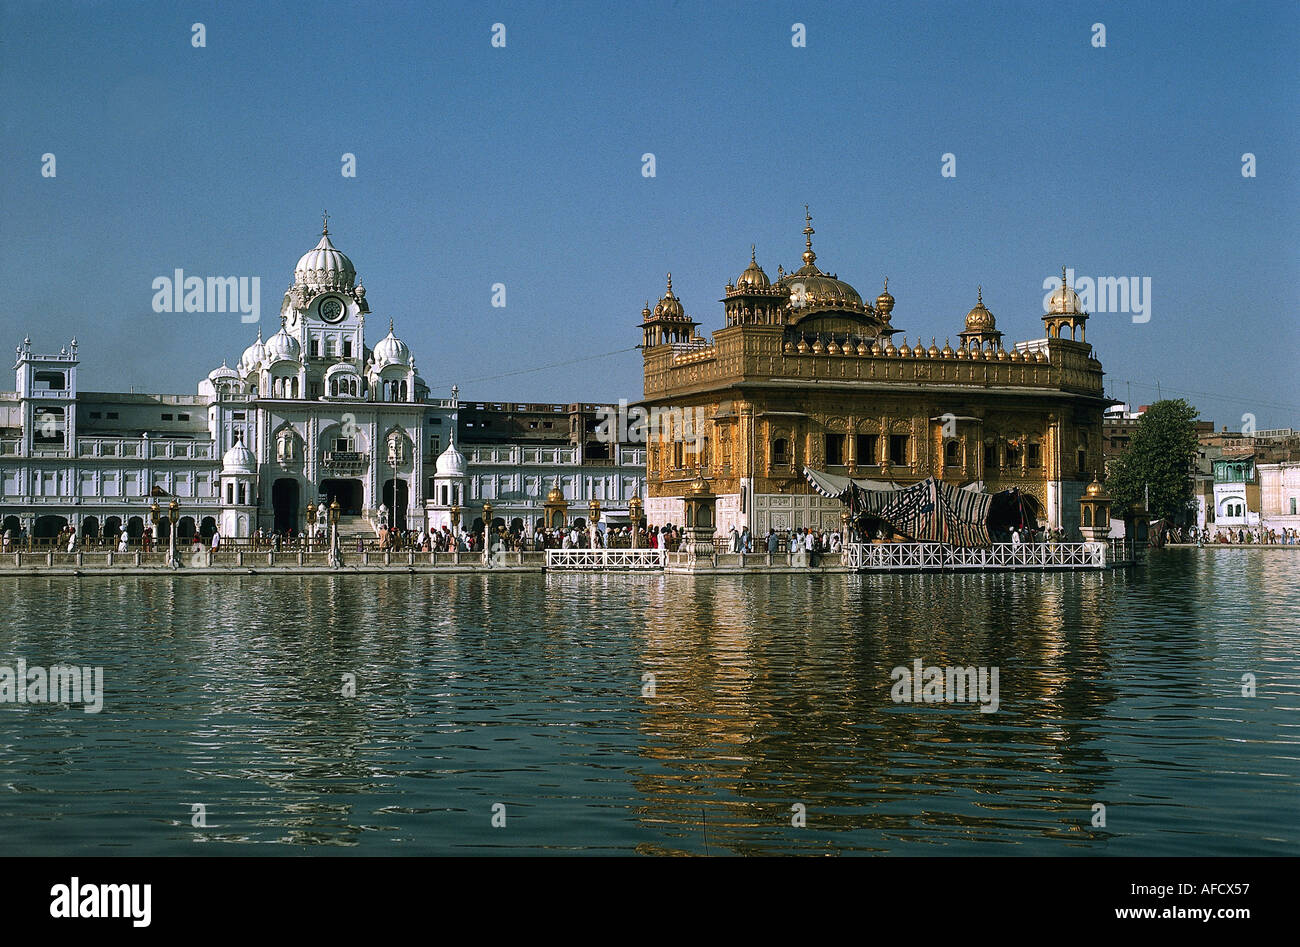 'Geografie, Indien, Amritsar, Goldener Tempel Darbar Sahib ('Hof des Herren'), Heiligtum der Sikhs, dahinter Akal Takht, erbau - Stock Image